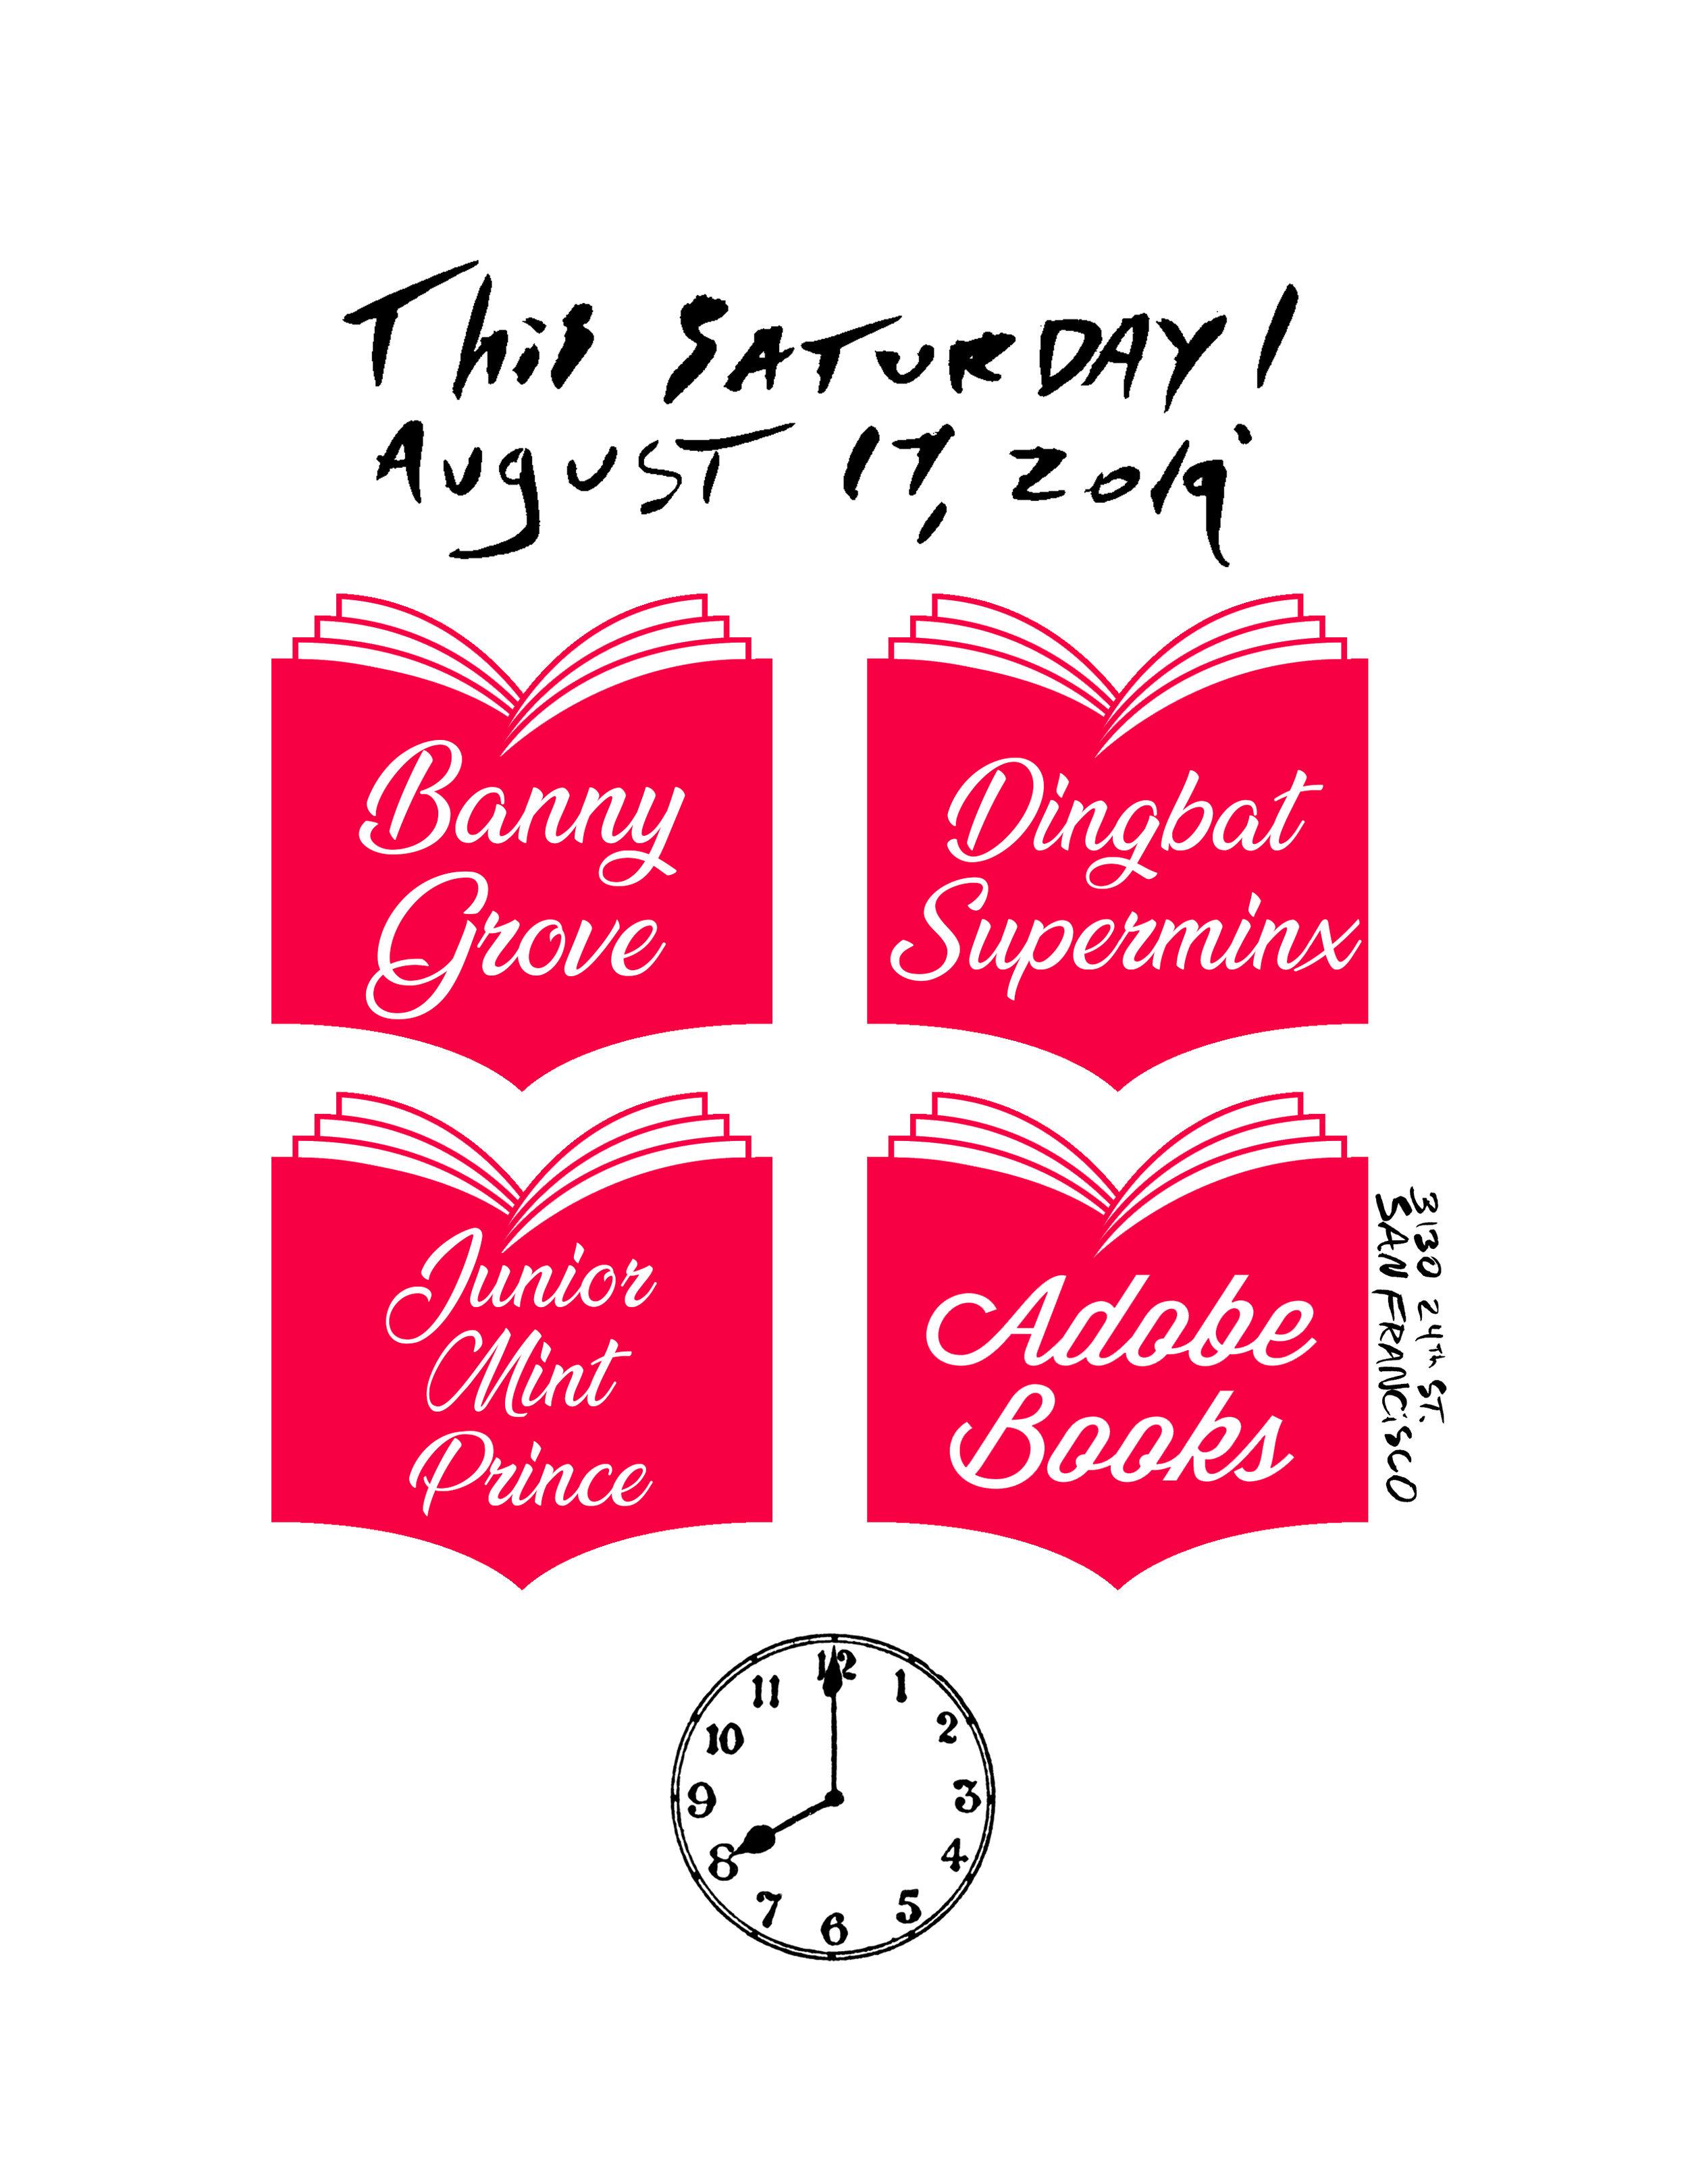 Banny Grove / Dingbat Superminx / Junior Mint Prince